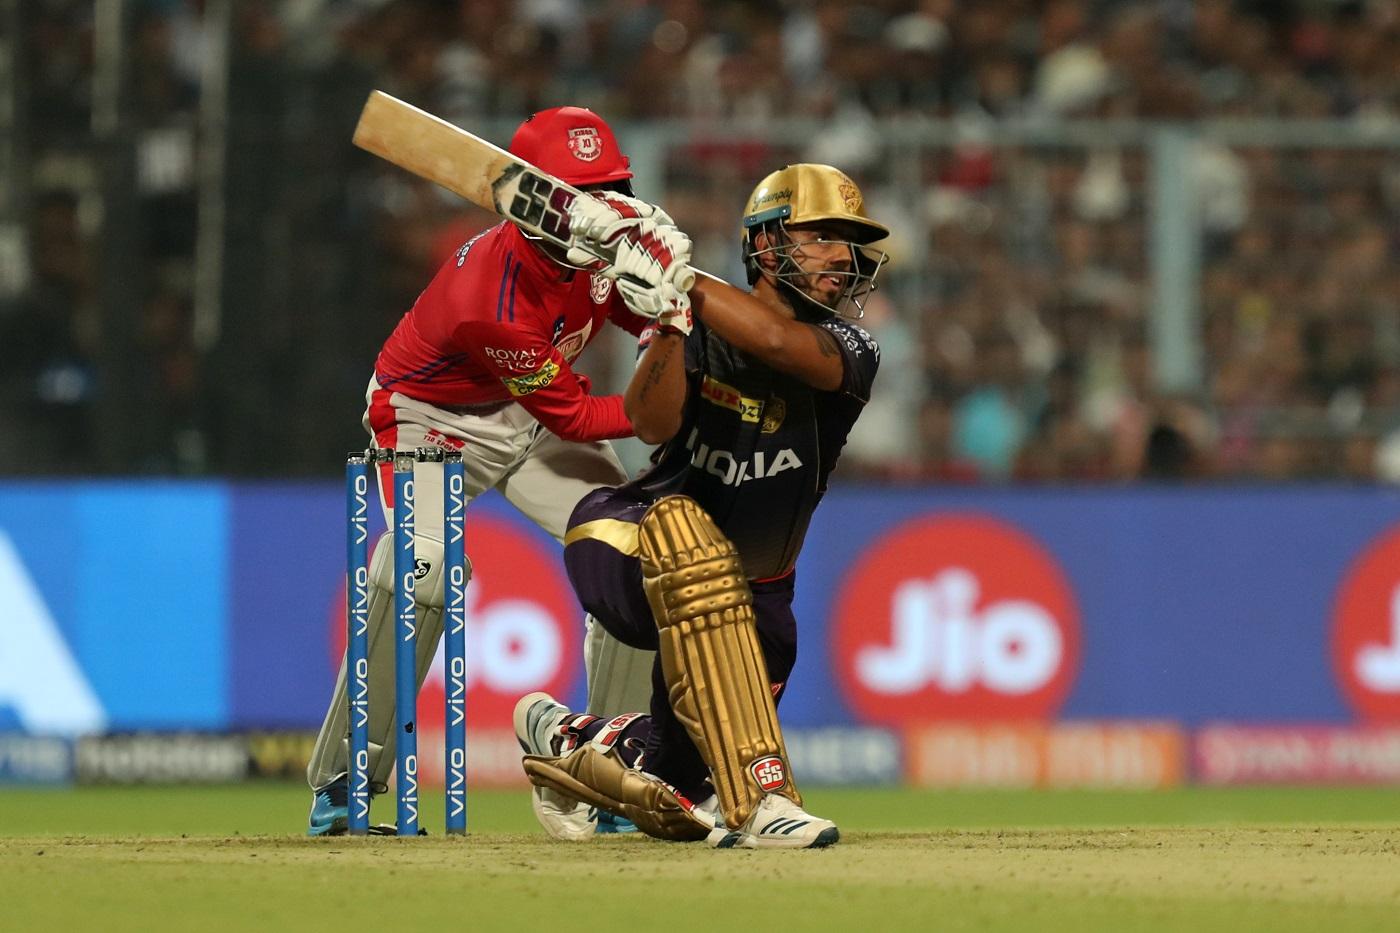 IPL 2019: Match 6, KKR vs KXIP - Twitter Rejoices As Kolkata Knight Riders Script Consecutive Wins 2